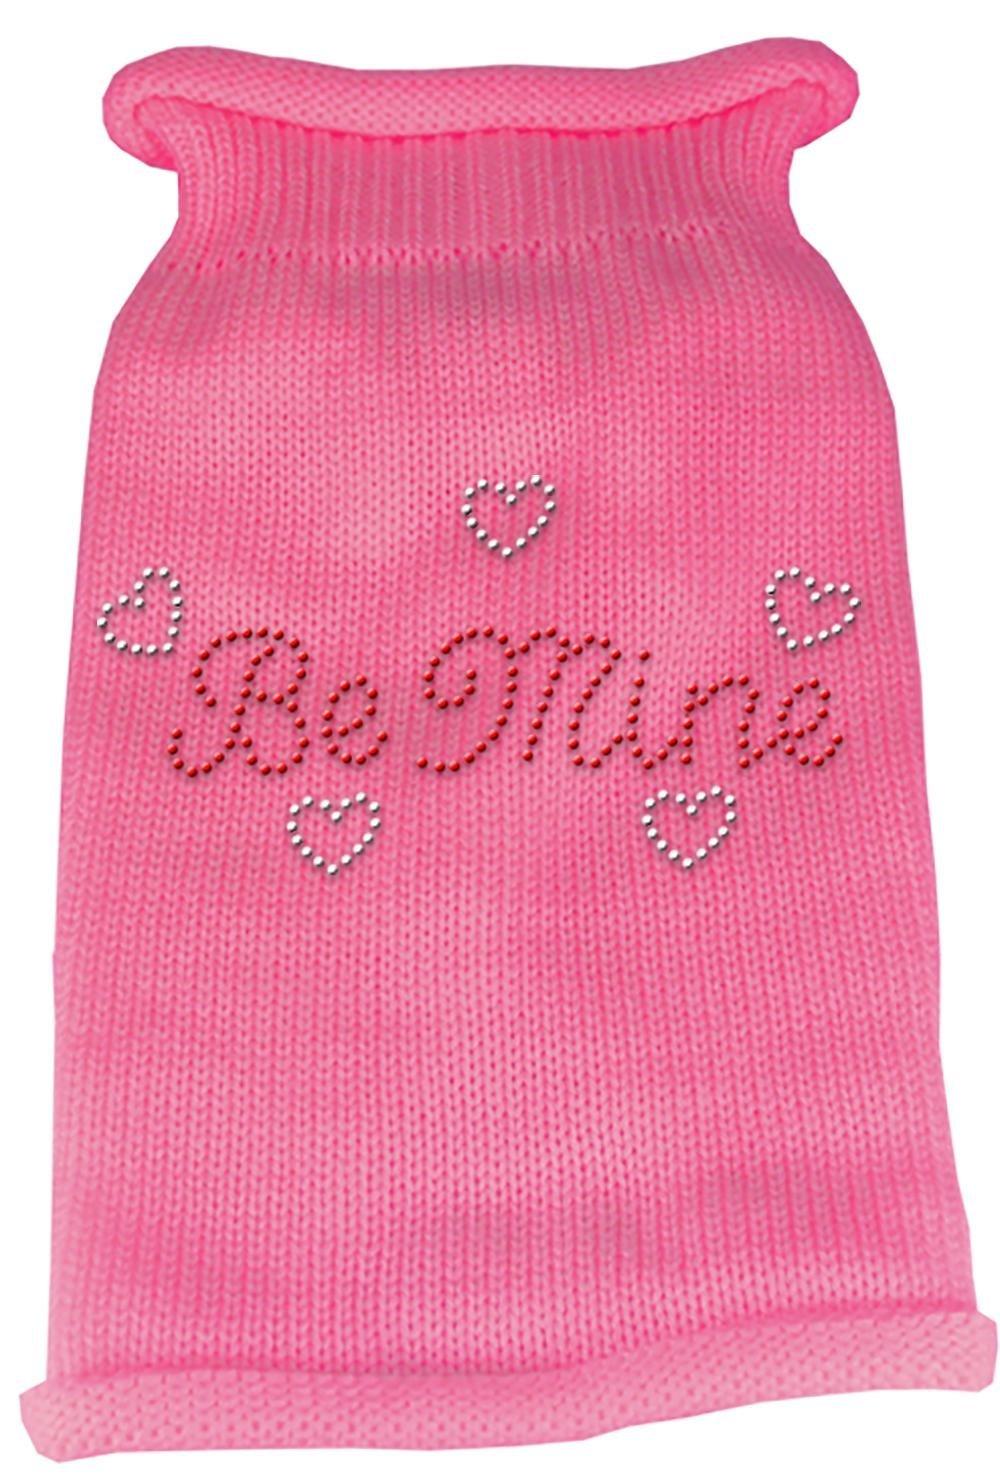 Mirage Pet Products Be Mine Rhinestone Knit Pet Sweater, X-Large, Pink